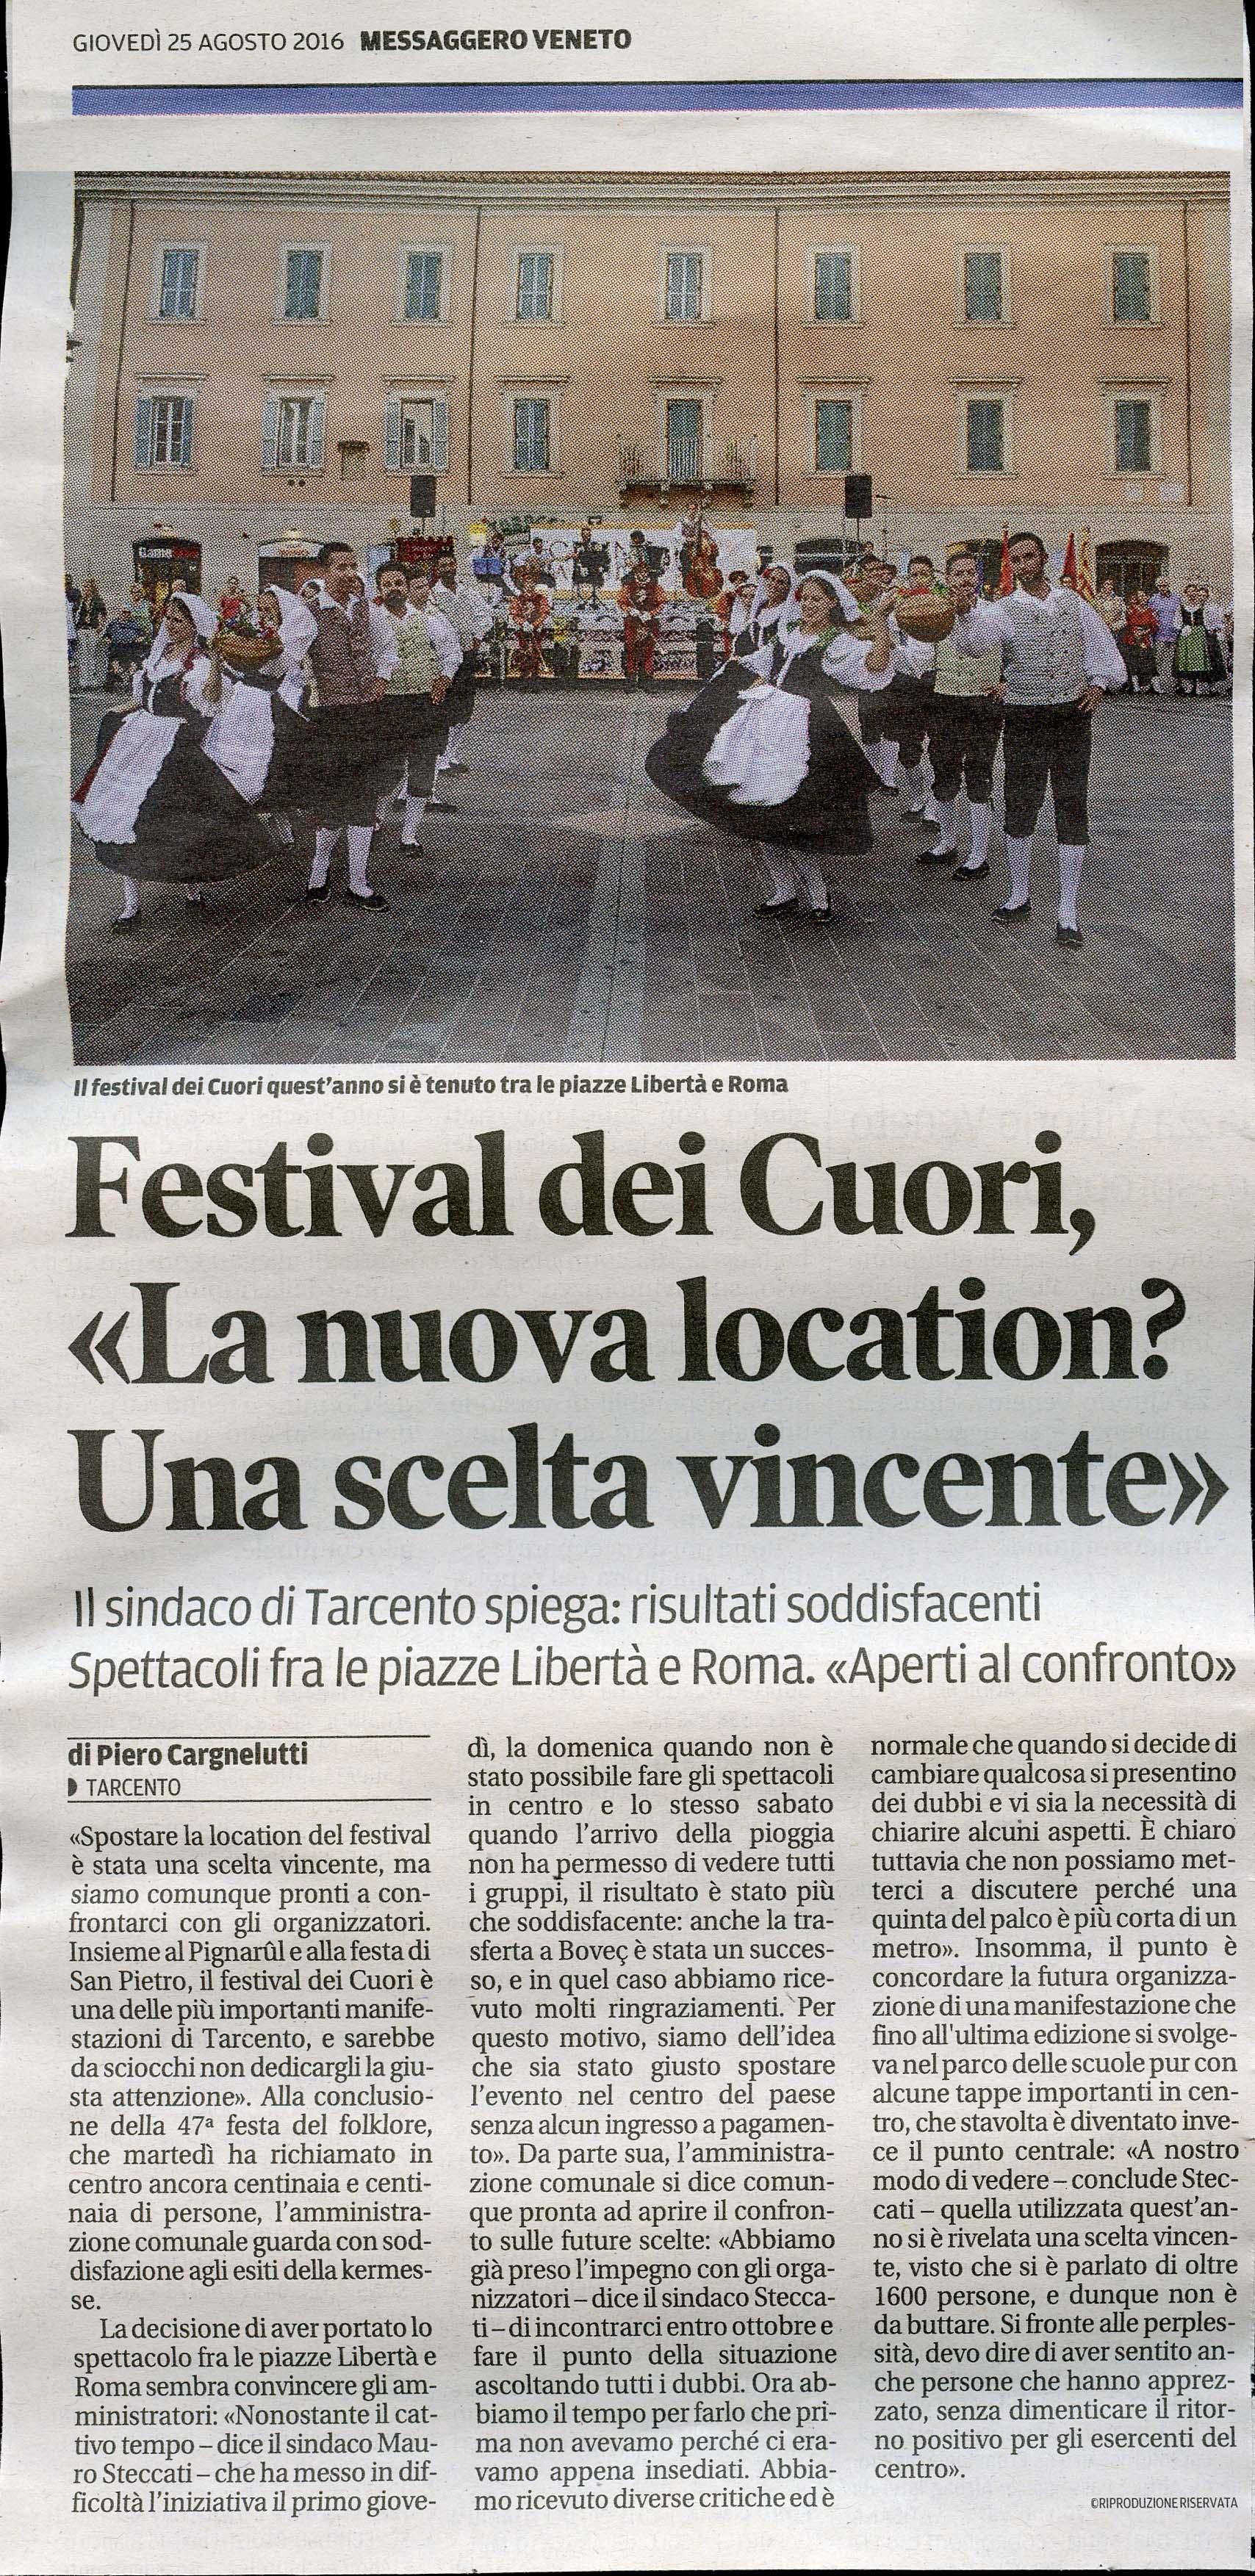 Messaggero Veneto 25.08.2016